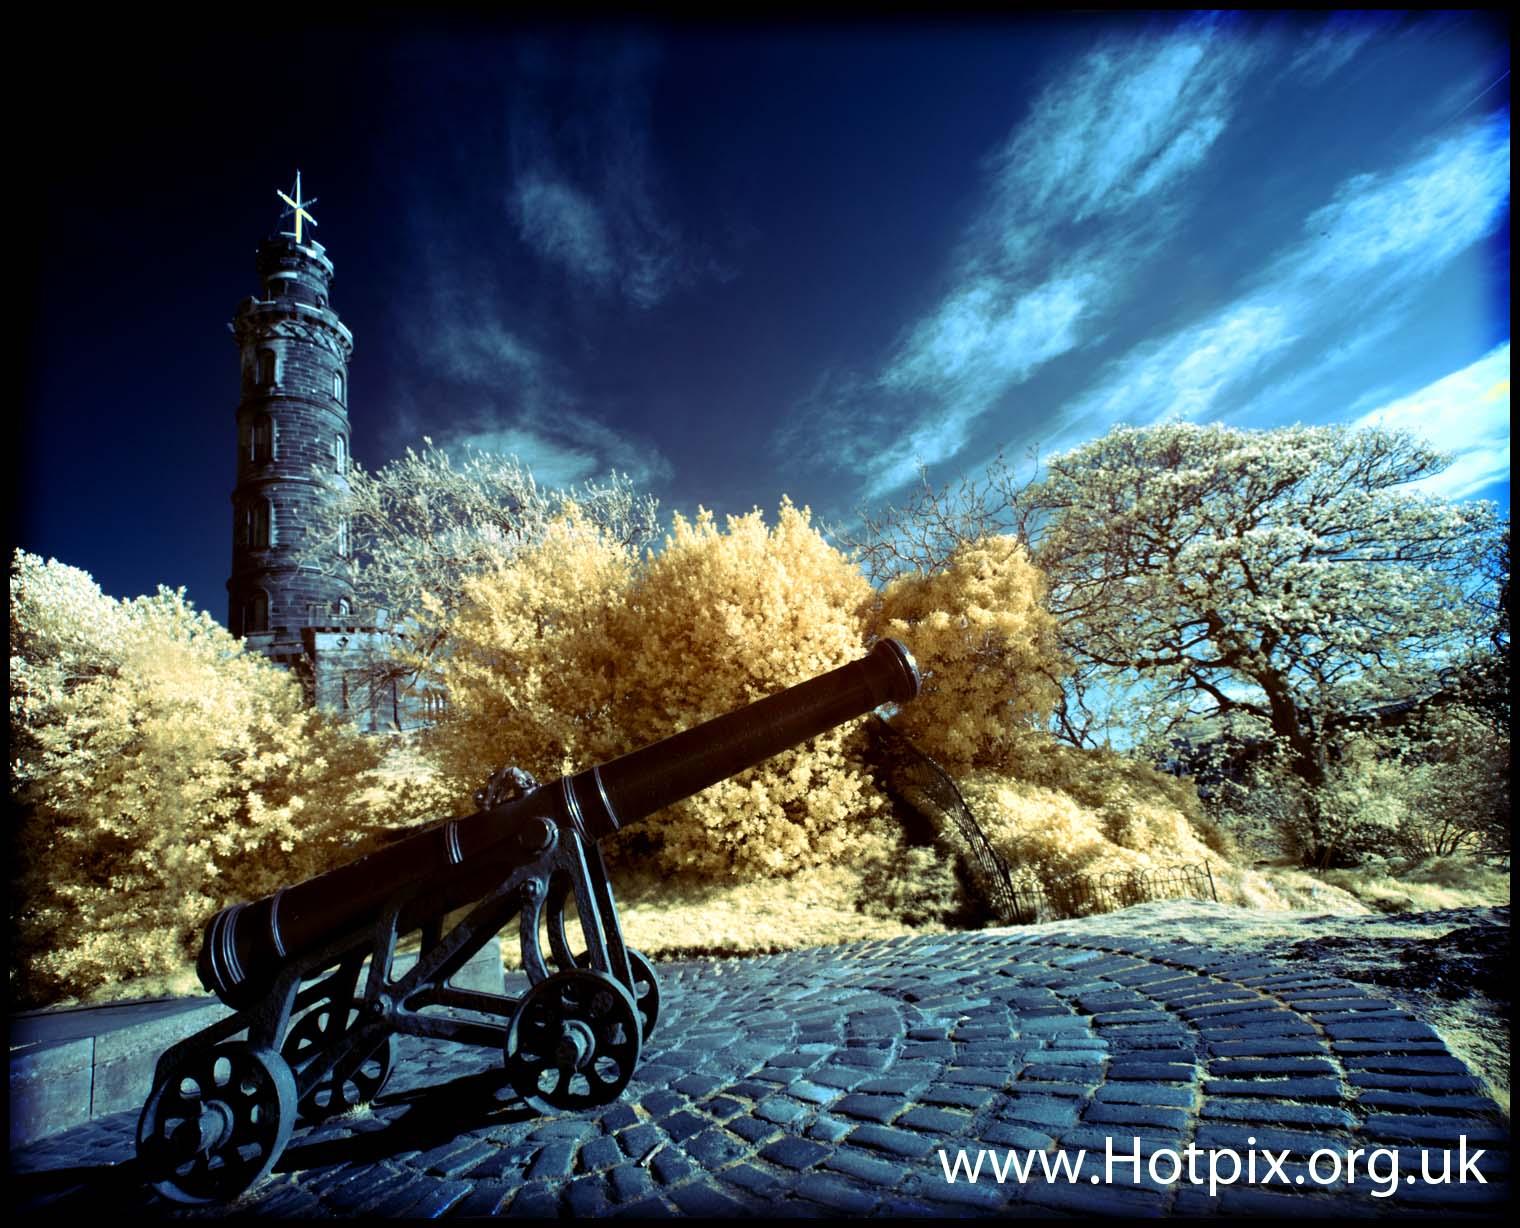 calton,carlton,hill,edinburgh,city,scotland,capital,tony,smith,scotlands,tourist,what,see,hotpix,IR,infra,red,infrared,color,colour,tonysmithhotpix,hot,pix,pics,false,HDR,hotpix.com,Edinburgh Photography,edimburgh